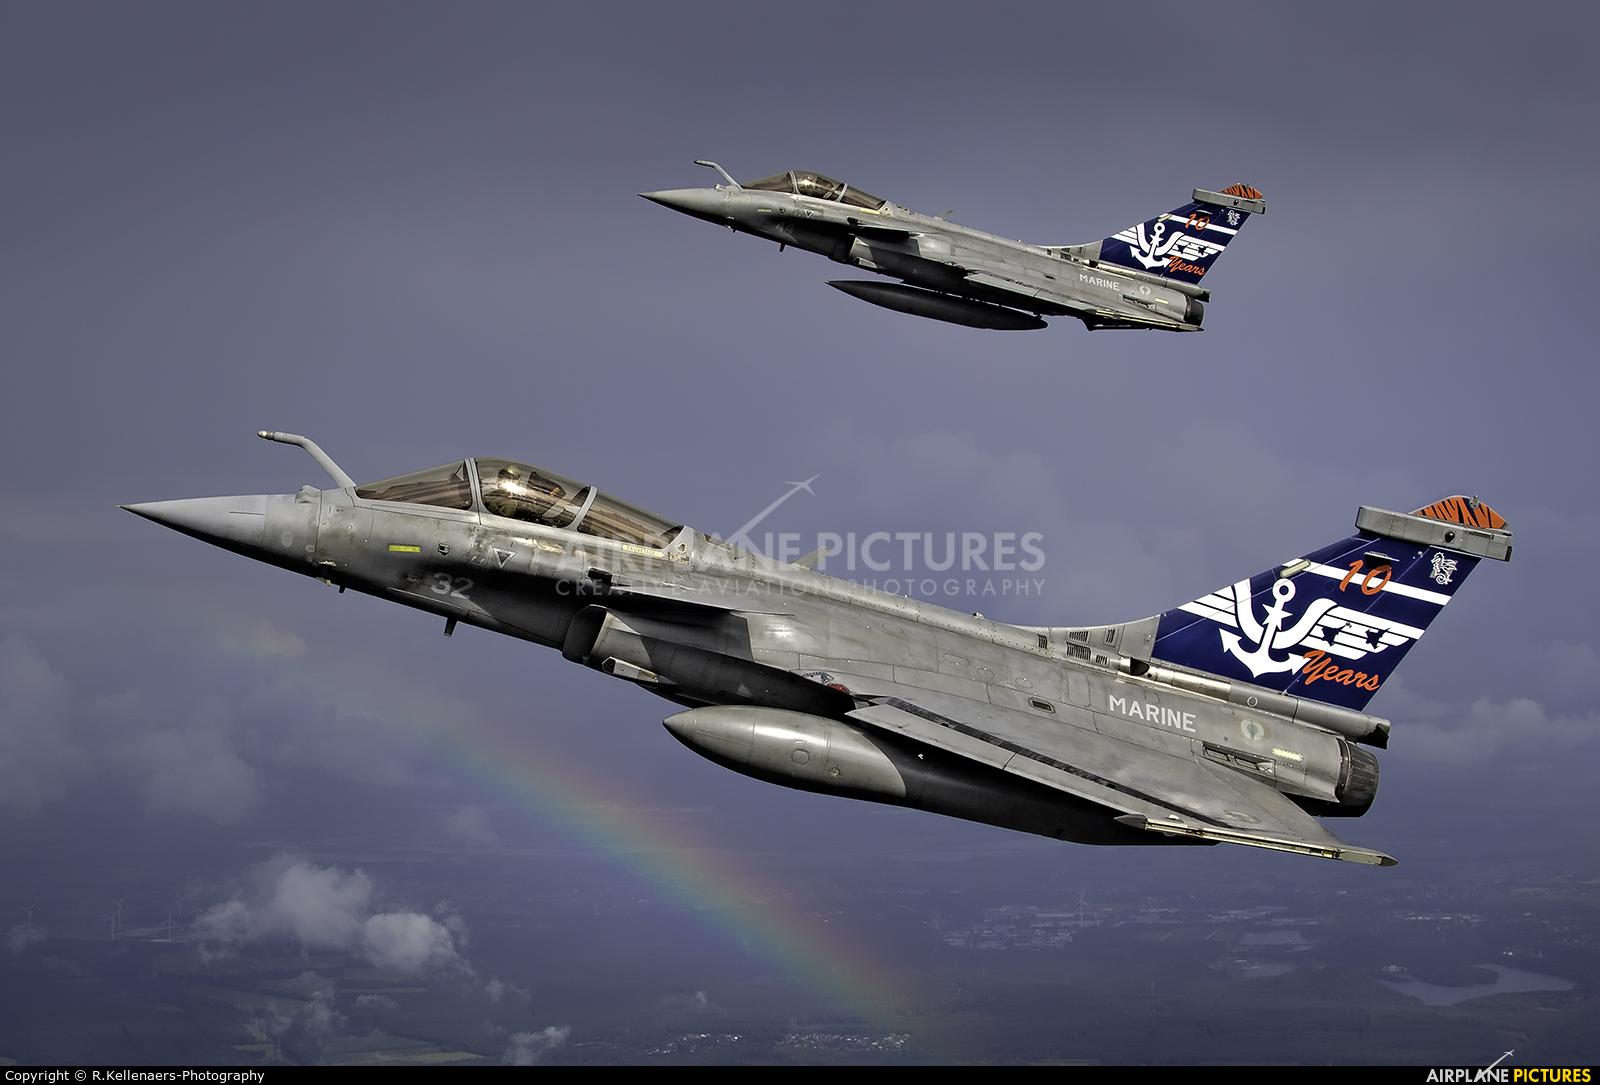 France - Navy 32 aircraft at In Flight - Belgium